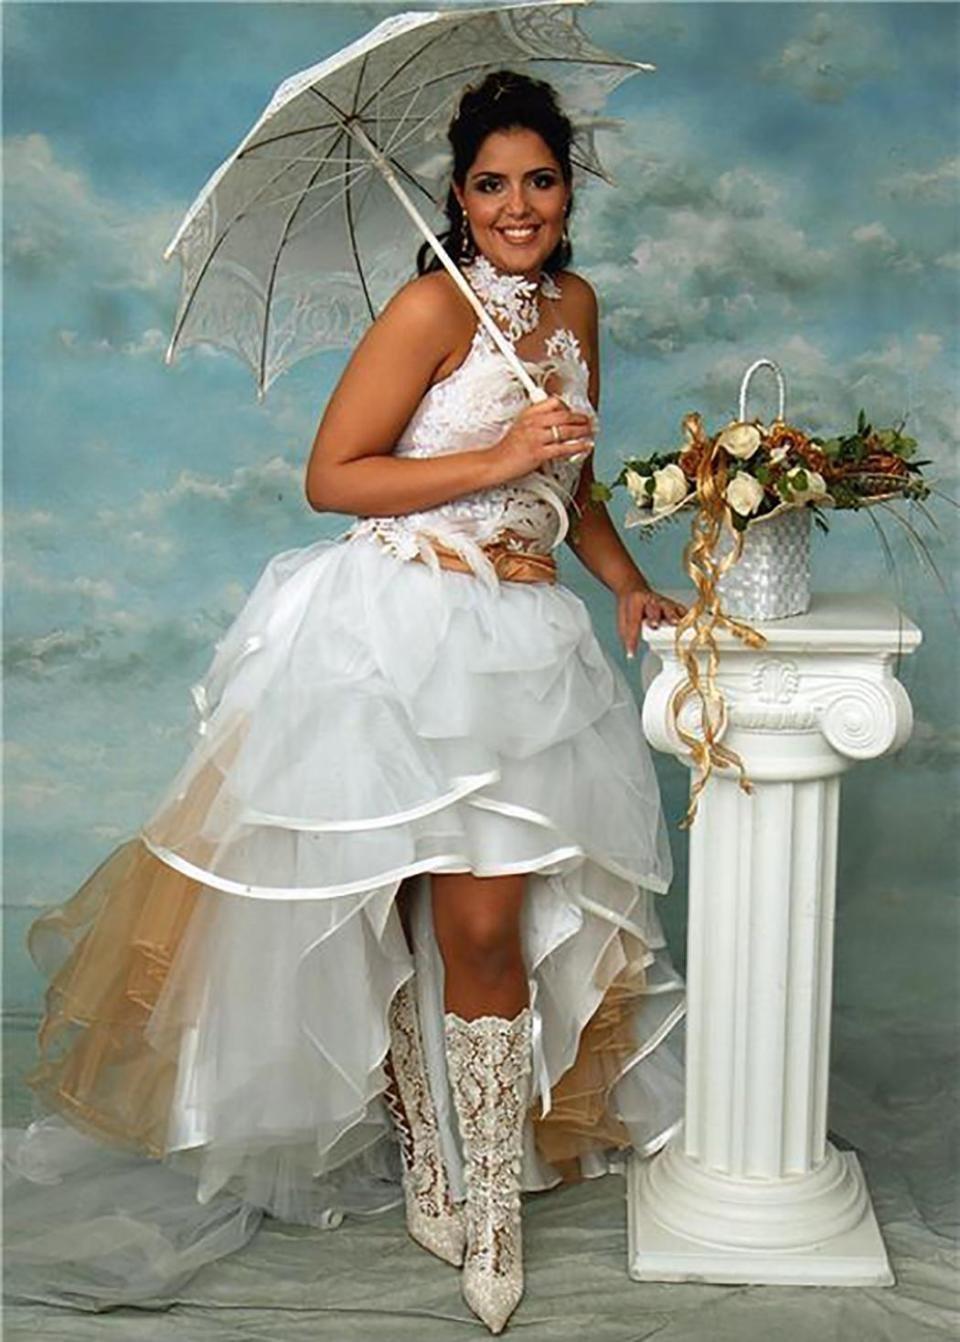 worst wedding dress pictures - HD800×1118